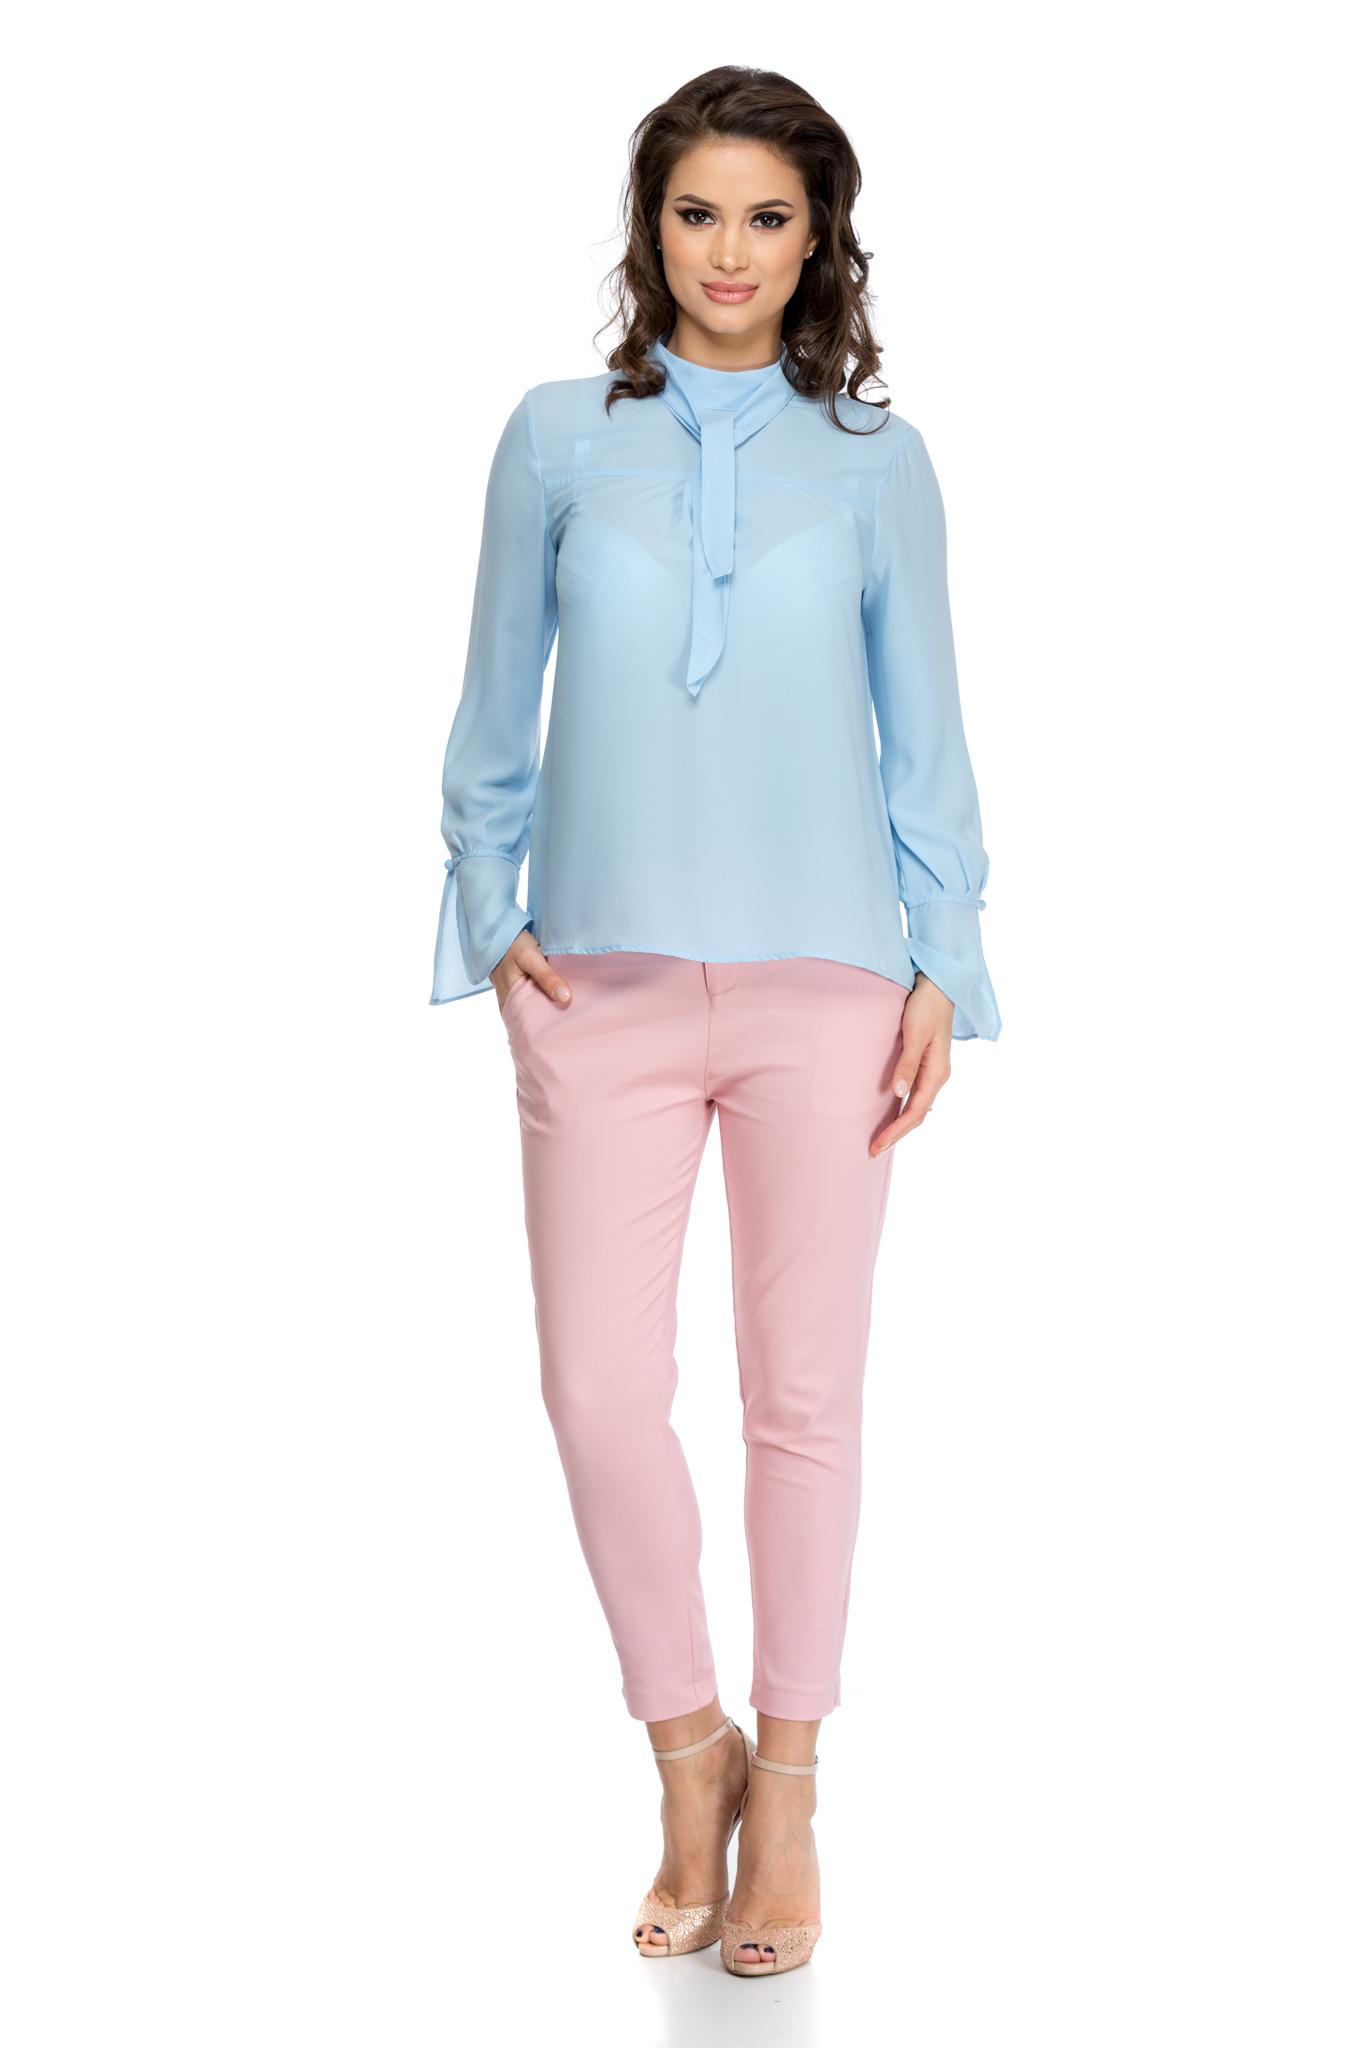 pantaloni novis roz